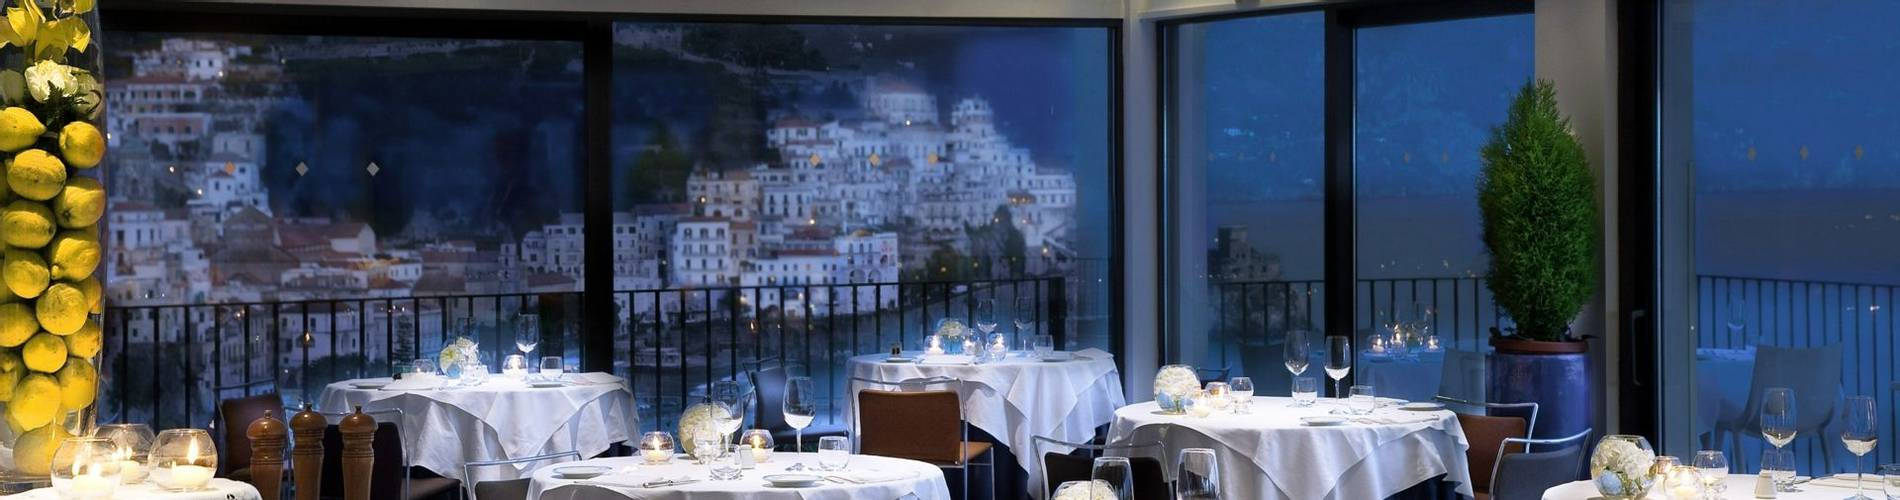 Miramalfi, Amalfi Coast, Italy (25).jpg